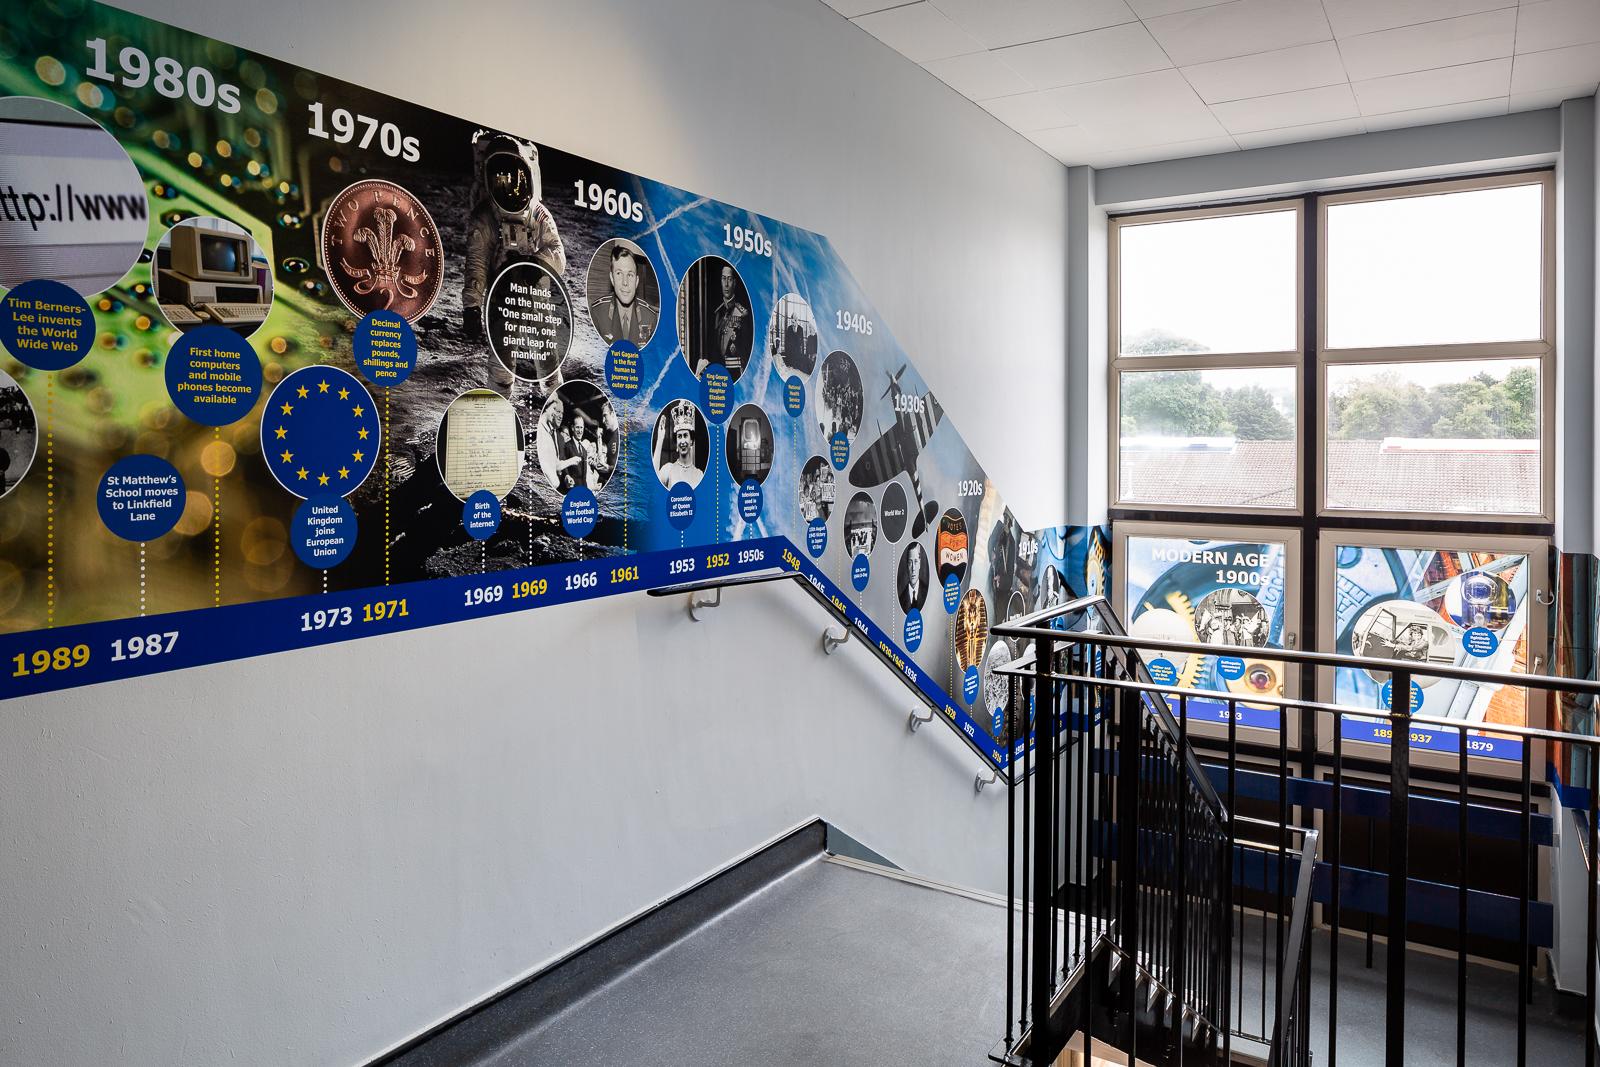 St Matthews school stairway wall art with vinyl window